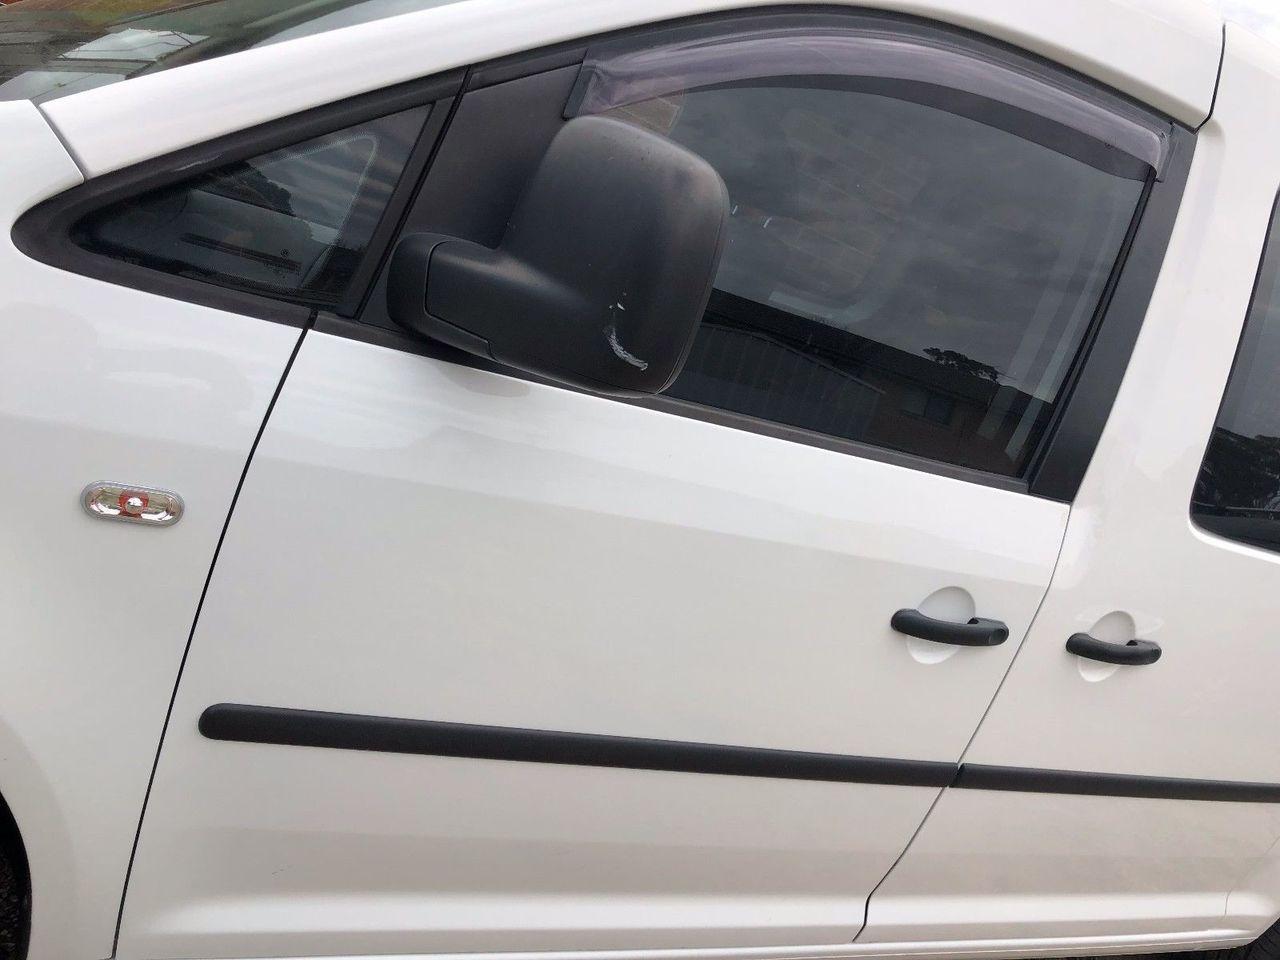 Volkswagen Caddy 2008 2014 Used Lhf Door Shell In White Paint Code